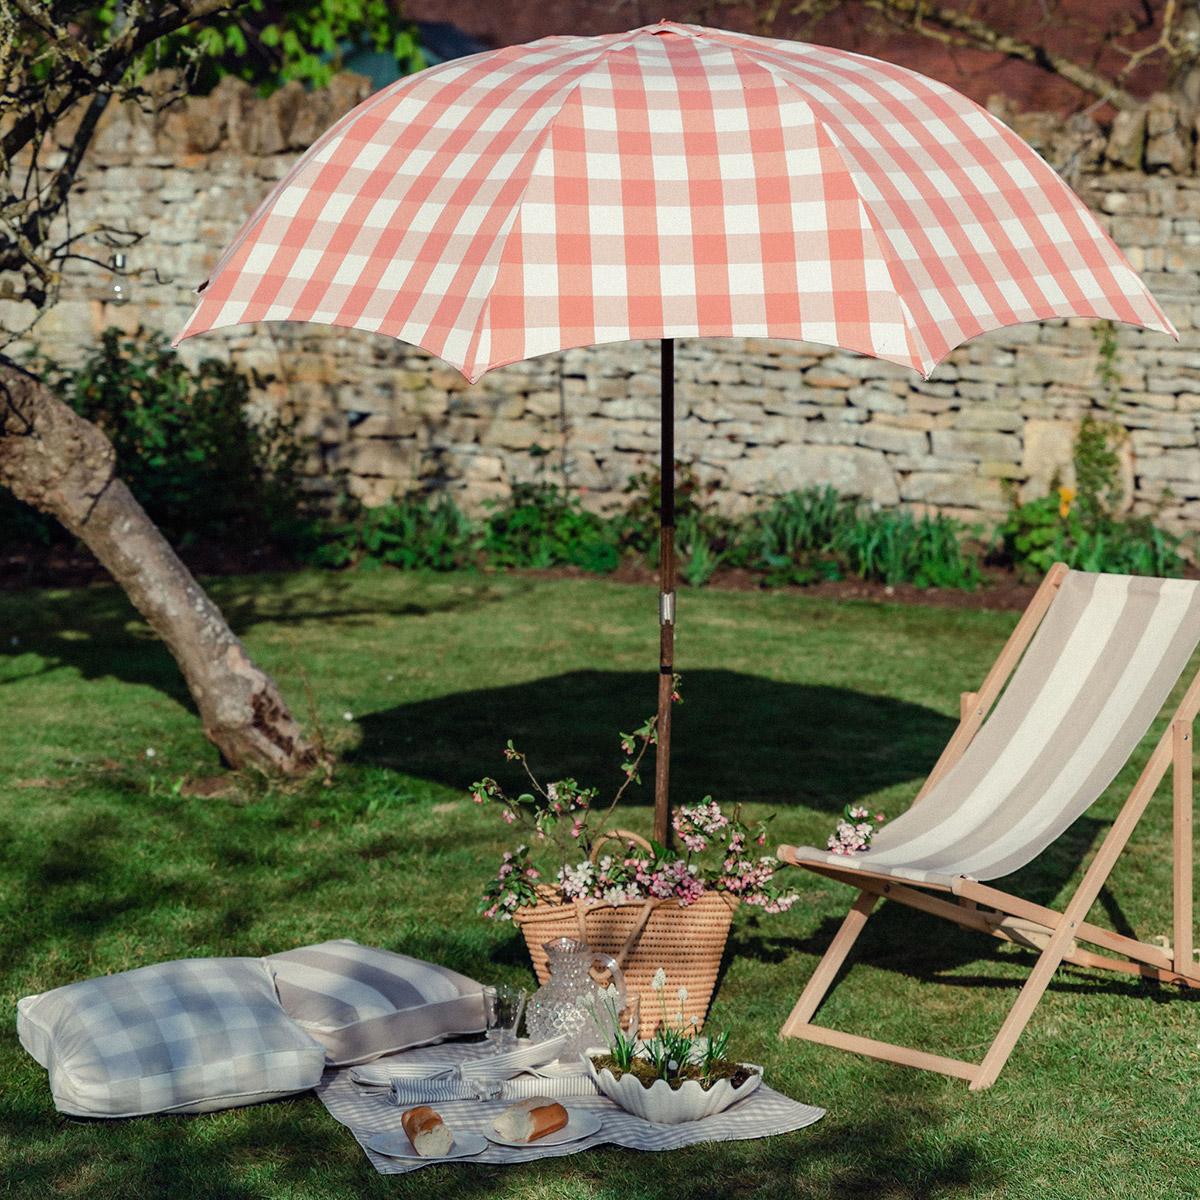 Studio Blackwell Fabric of Summer Picnic Bespoke Parasol, Tuckermat, Deckchair & Napkins